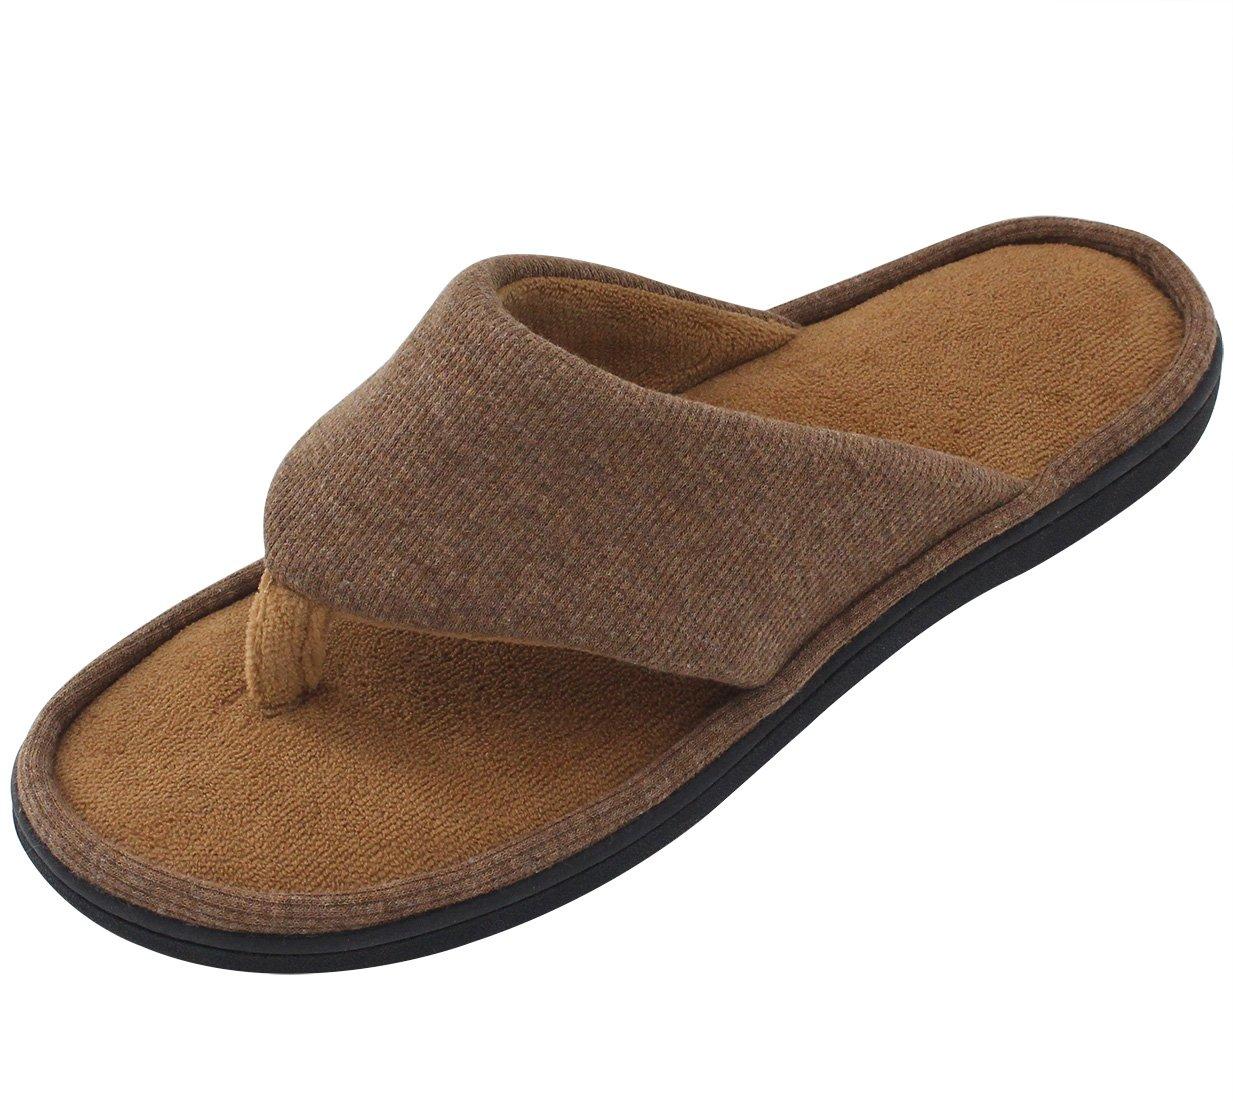 RockDove Memory Foam Men's Flip Flop House Slippers, Spring Summer Open Toe Thong Sandals w/ Indoor Outdoor Shoe Sole, Chestnut Brown, 11-12 D(M) US